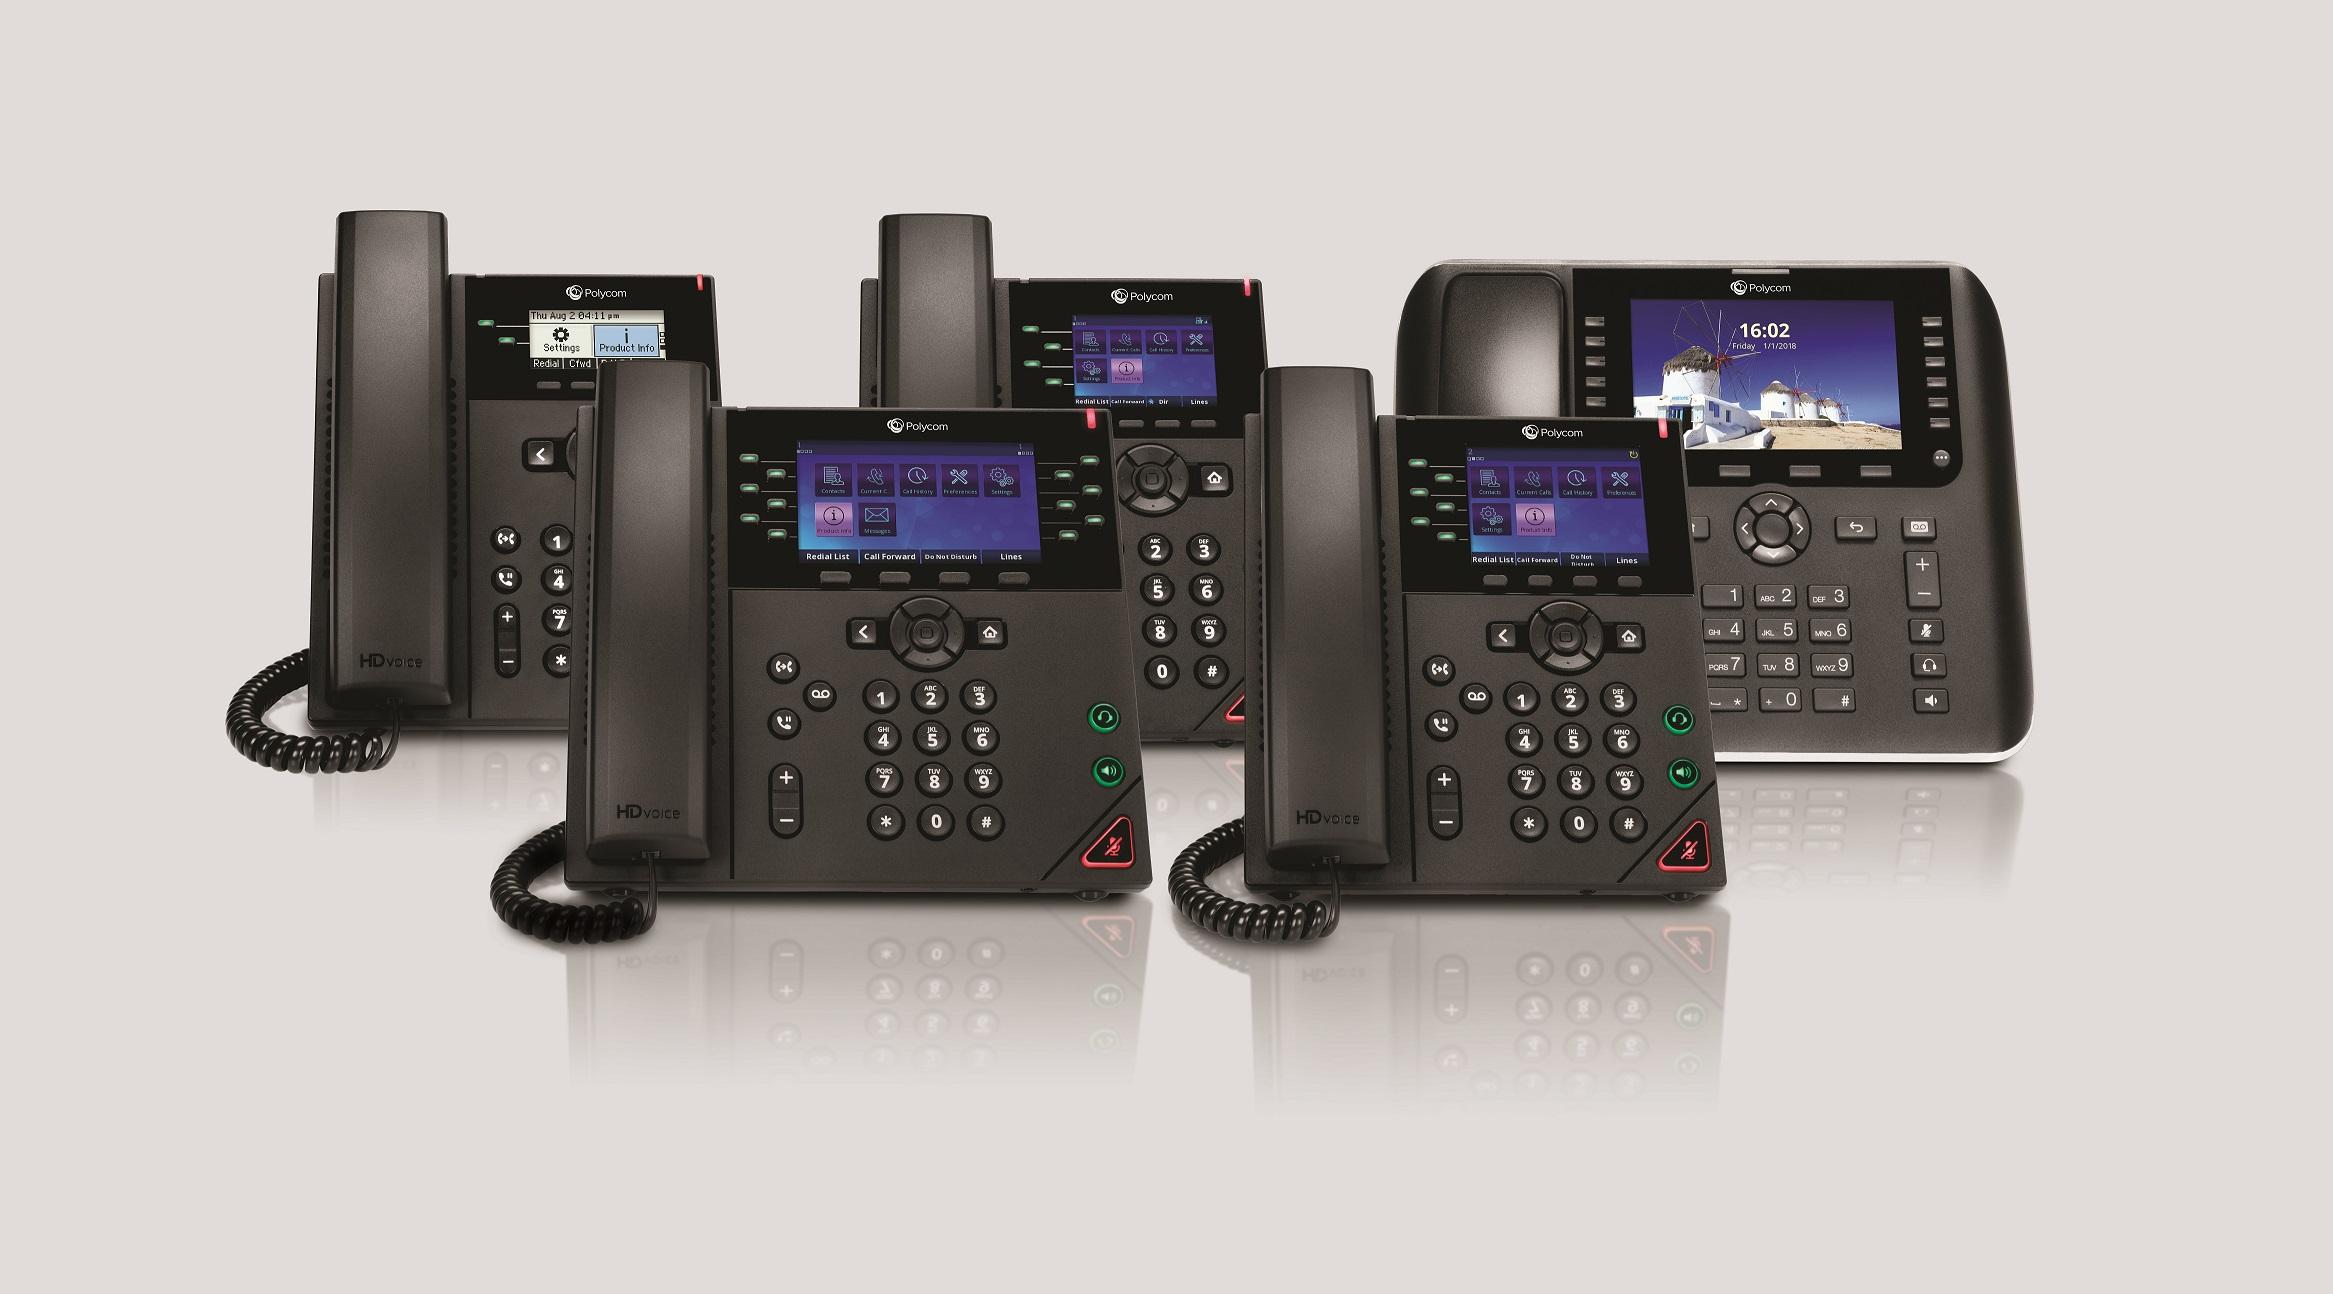 Polycom phone systems